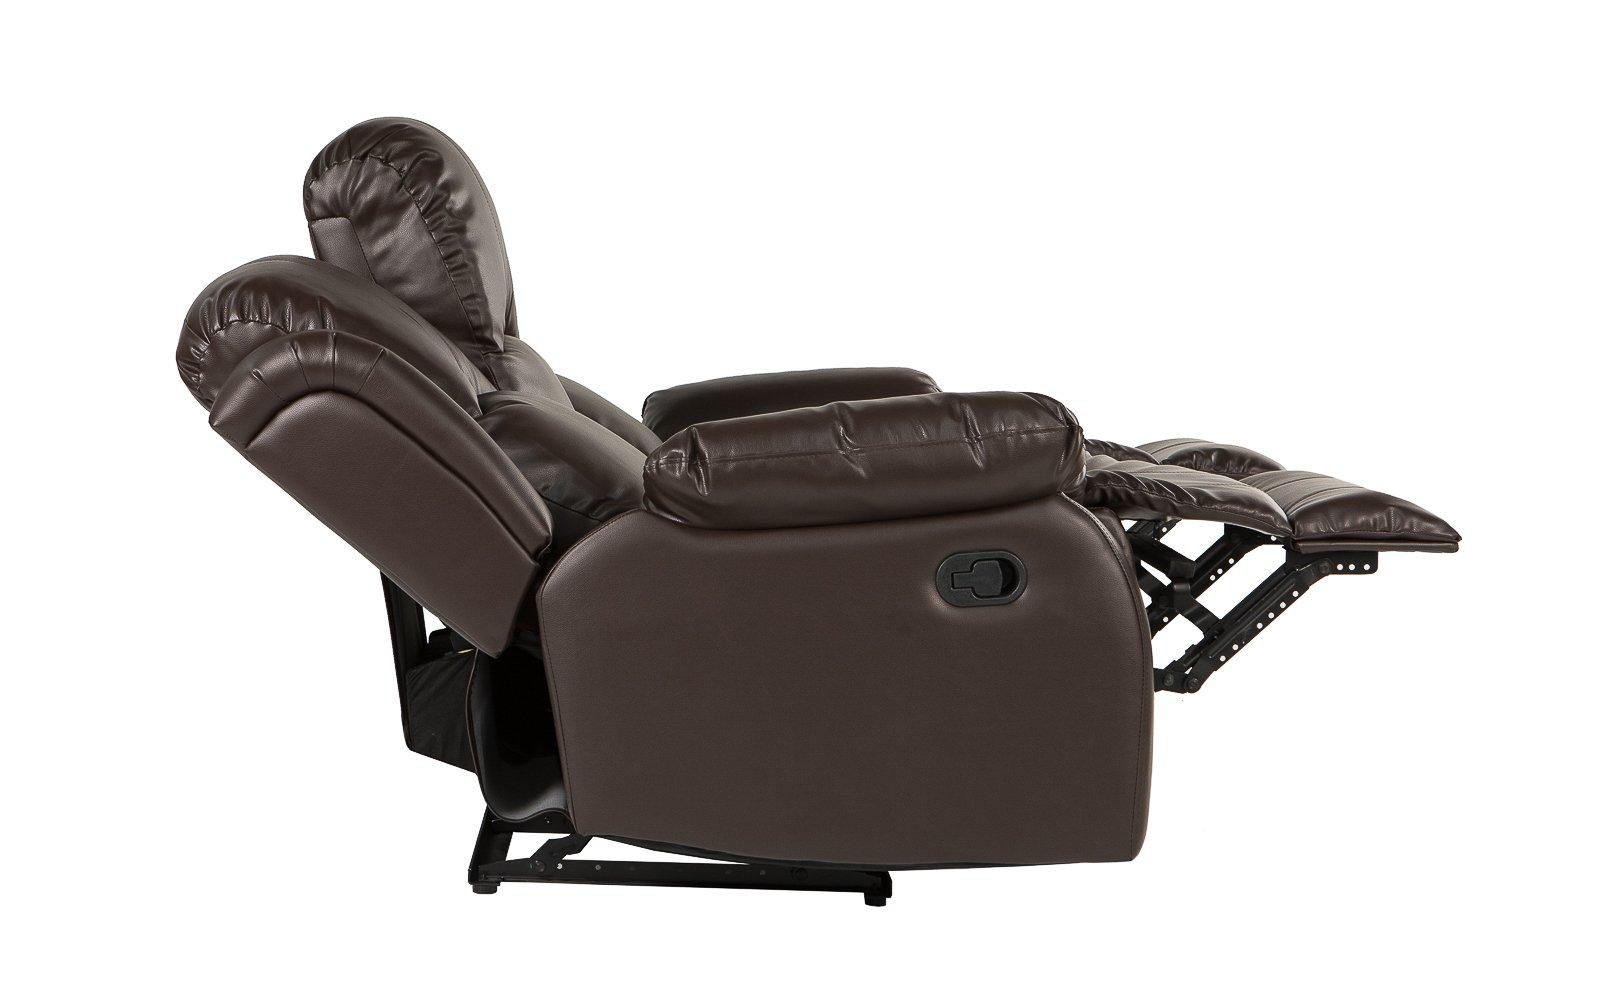 Sofa recliner ... bob classic bonded leather recliner sofa side profile DAQXODW